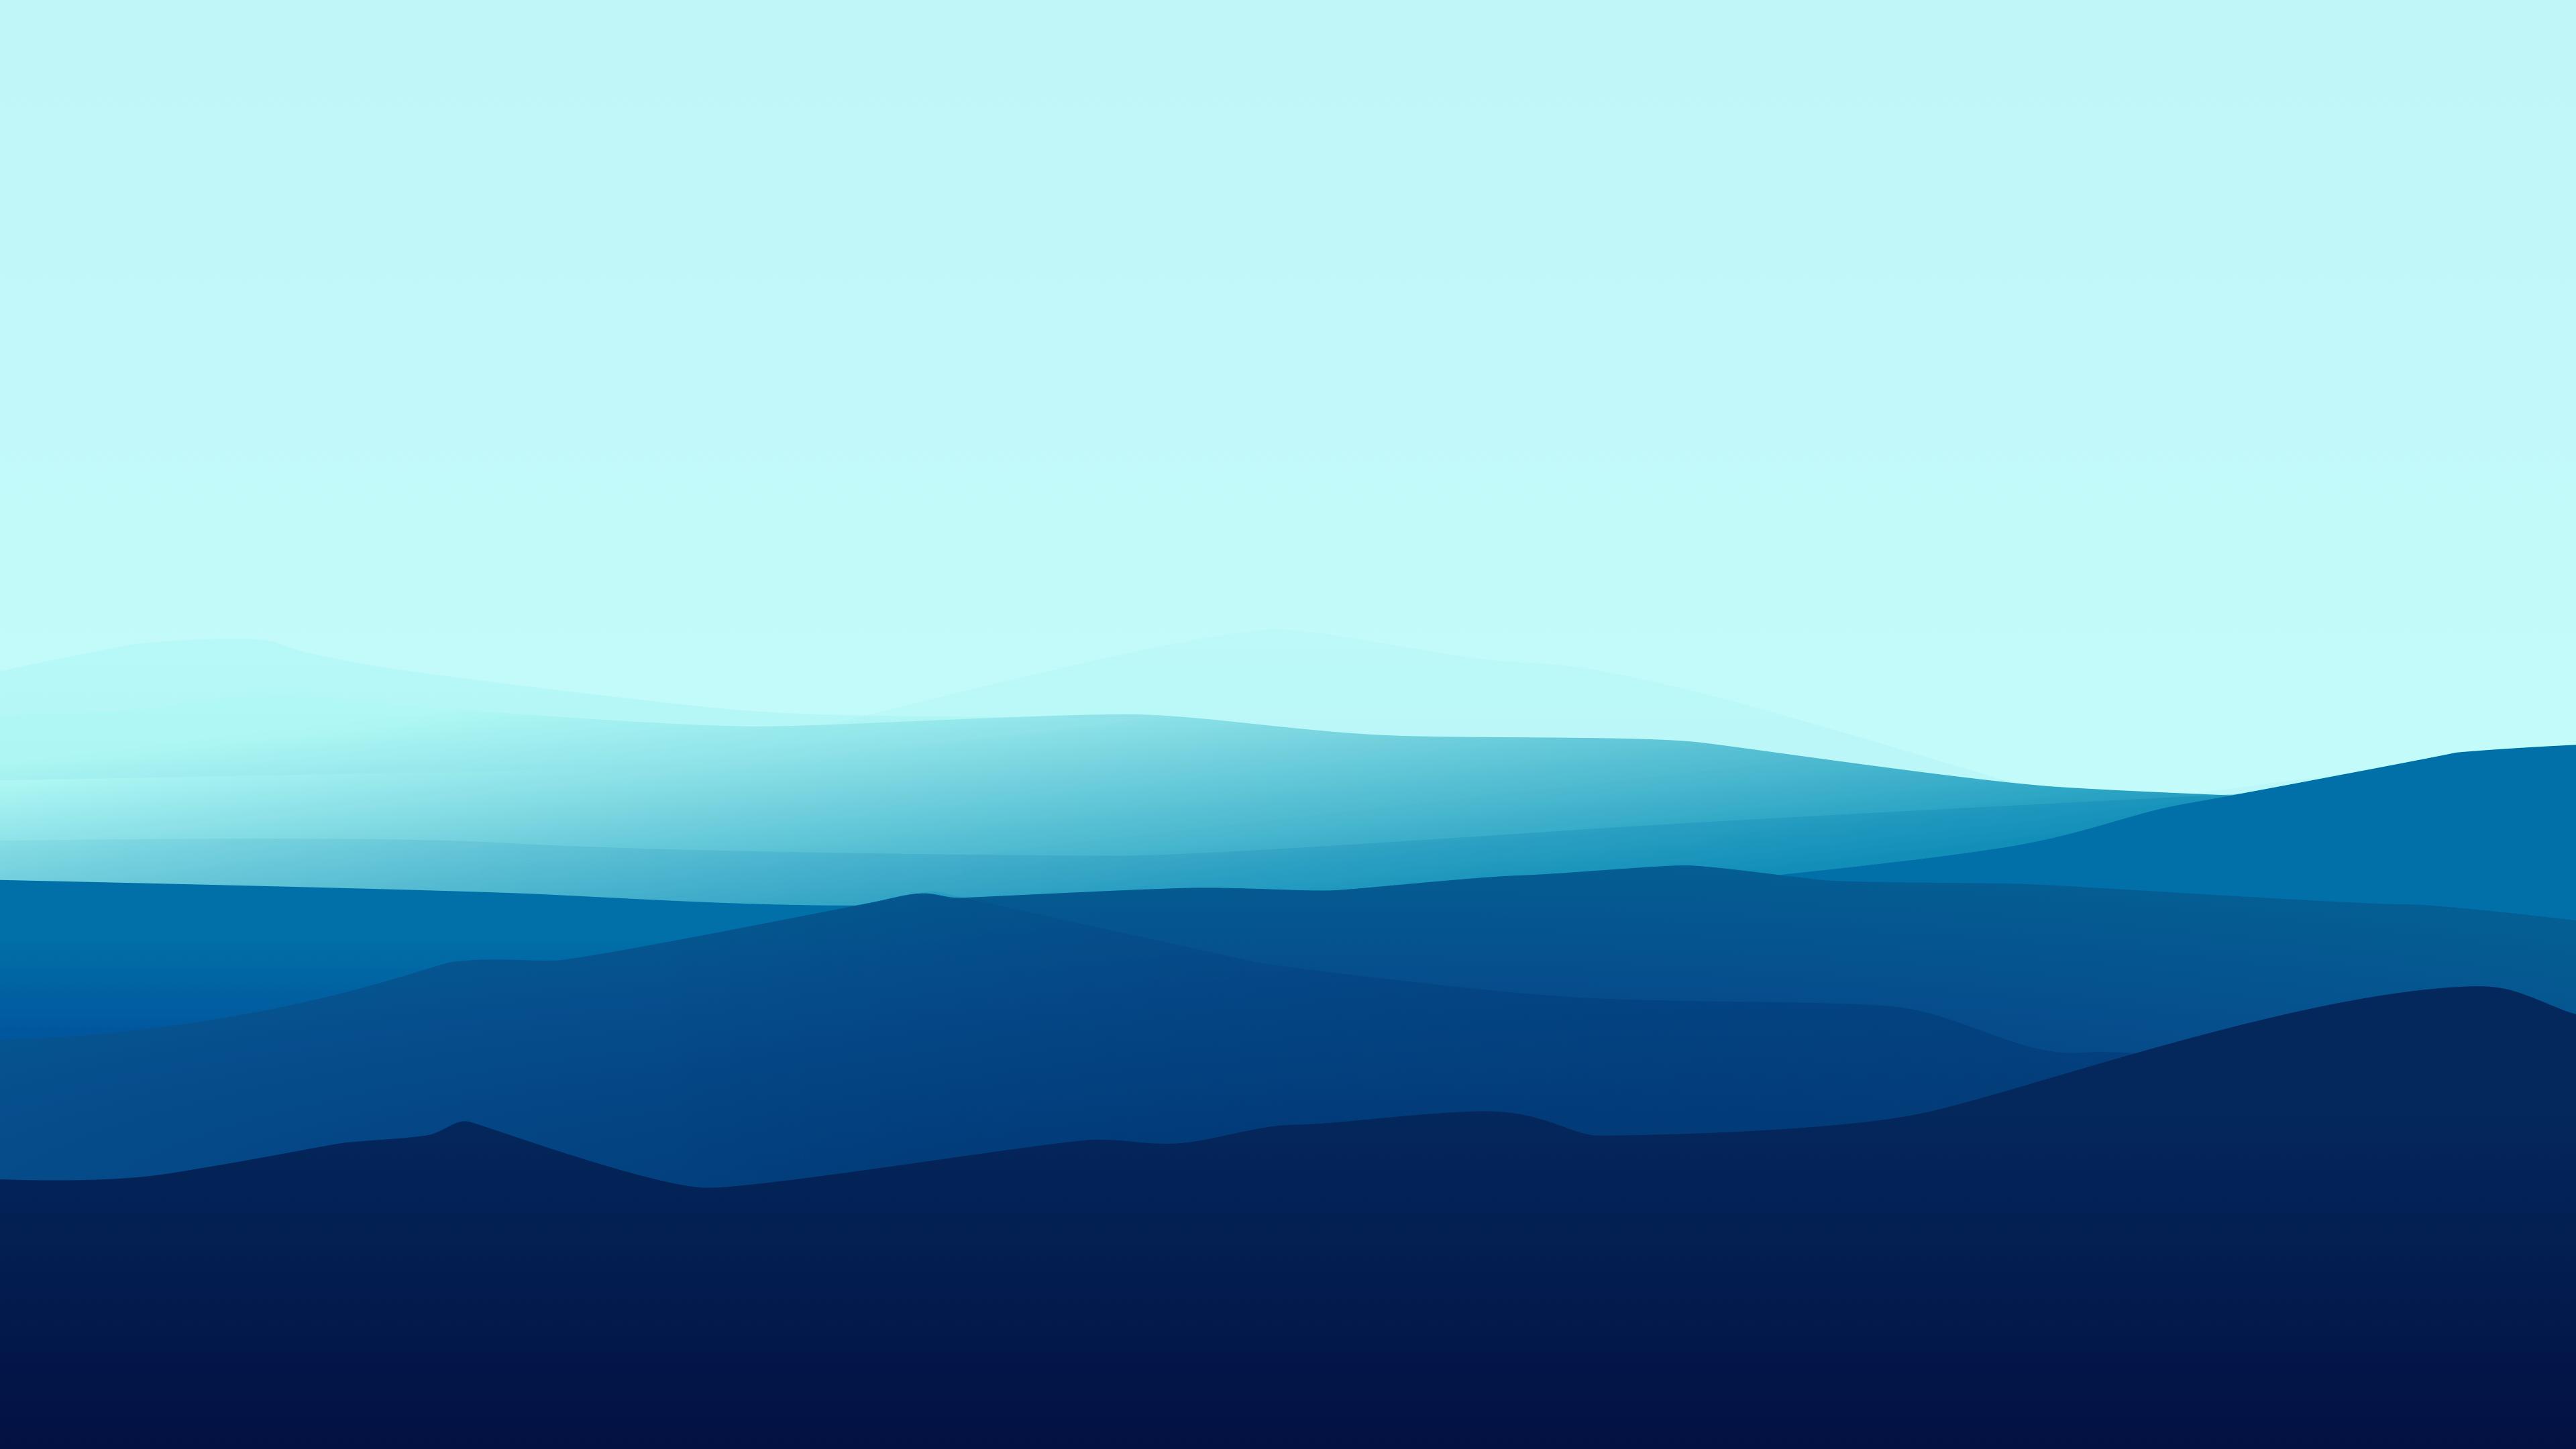 Minimal Mac Wallpapers Top Free Minimal Mac Backgrounds